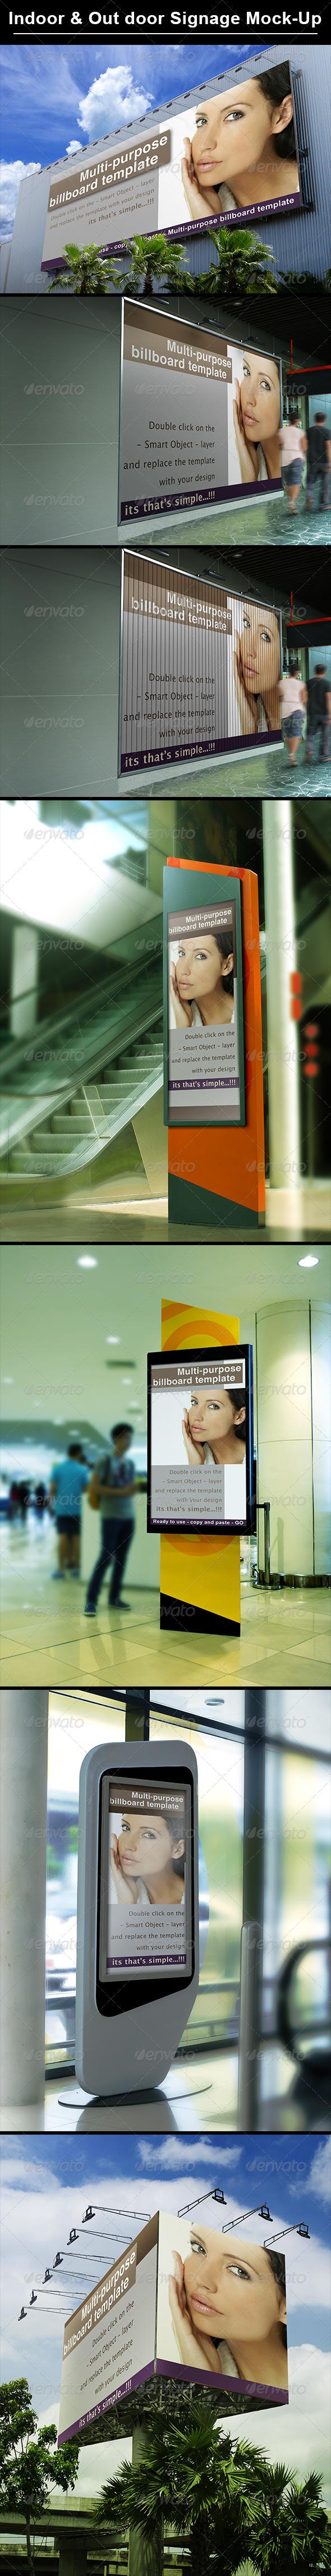 GraphicRiver Billboard & Indoor Signage Display Mock Up 8695551